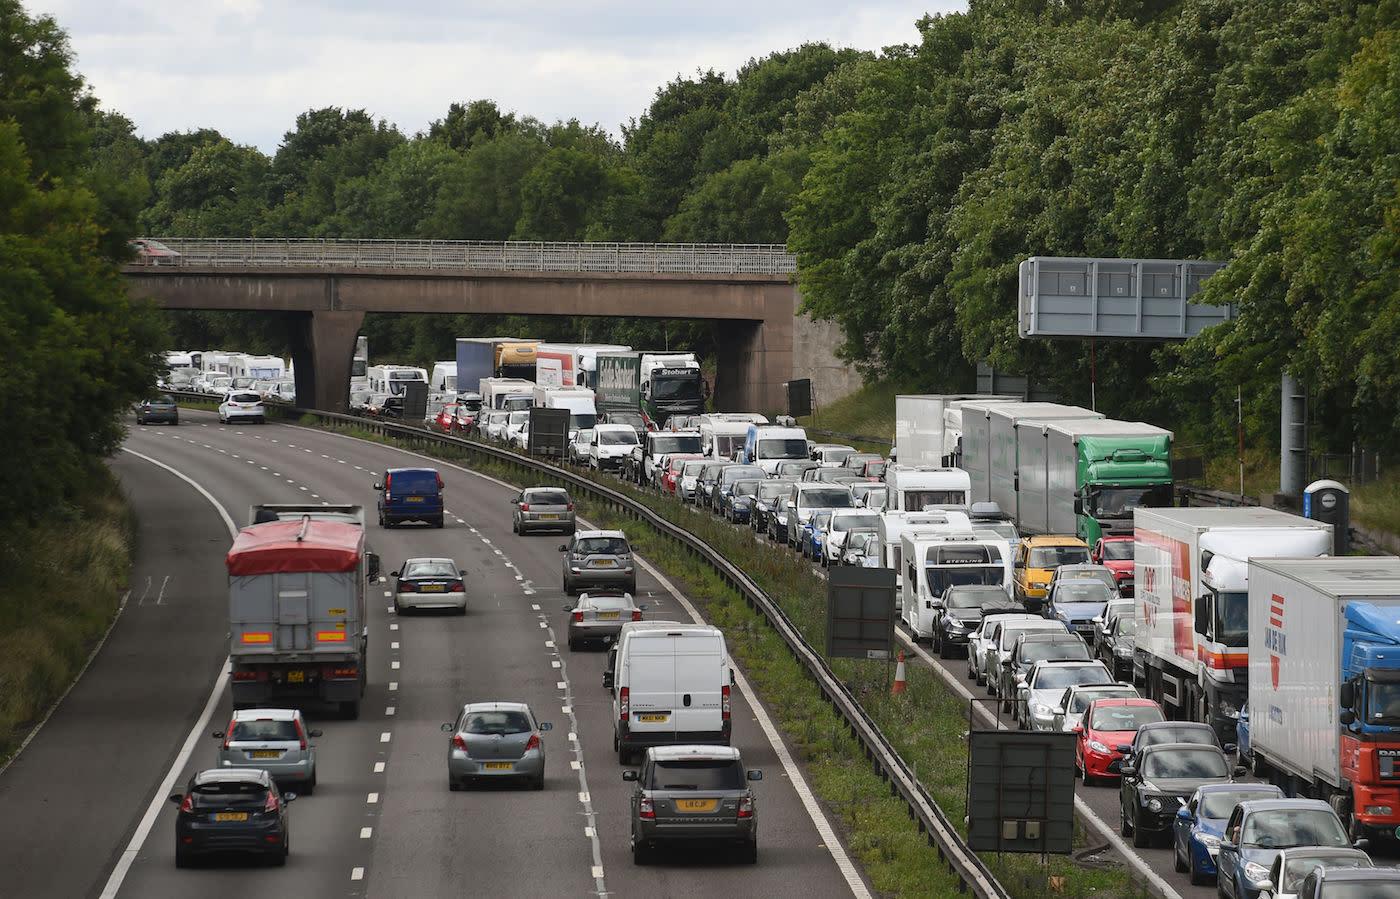 Police officer killed in car crash on M6 motorway near Carlisle